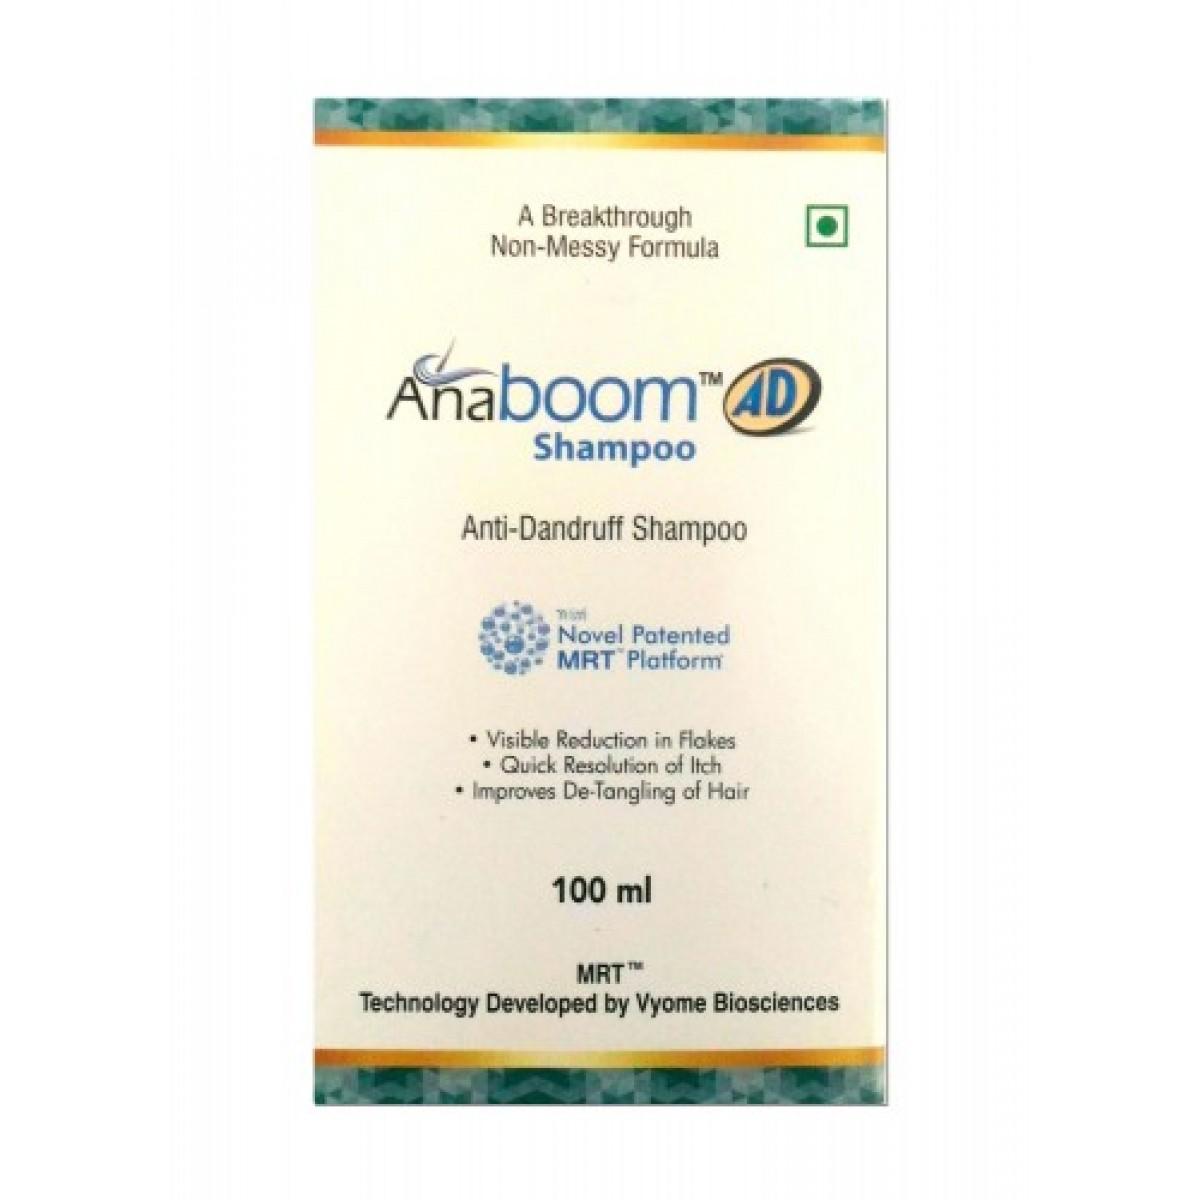 Anaboom shampoo anti dandruff shampoo 100ml